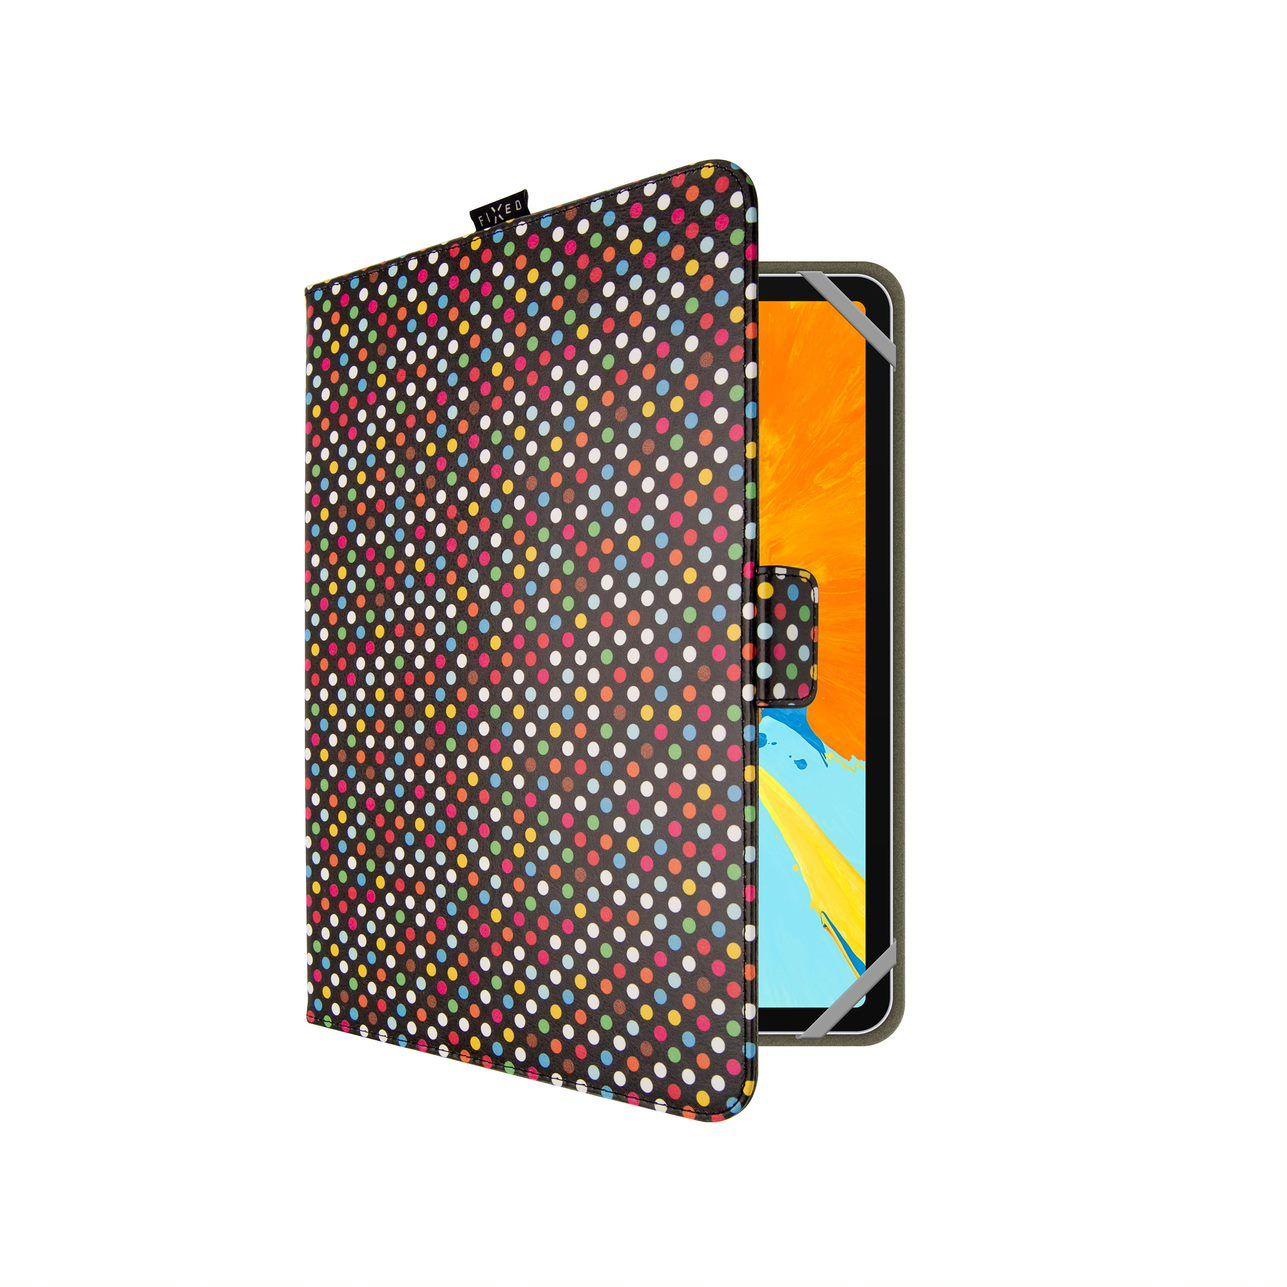 Pouzdro pro 10,1' tablety FIXED Novel, motiv Dots